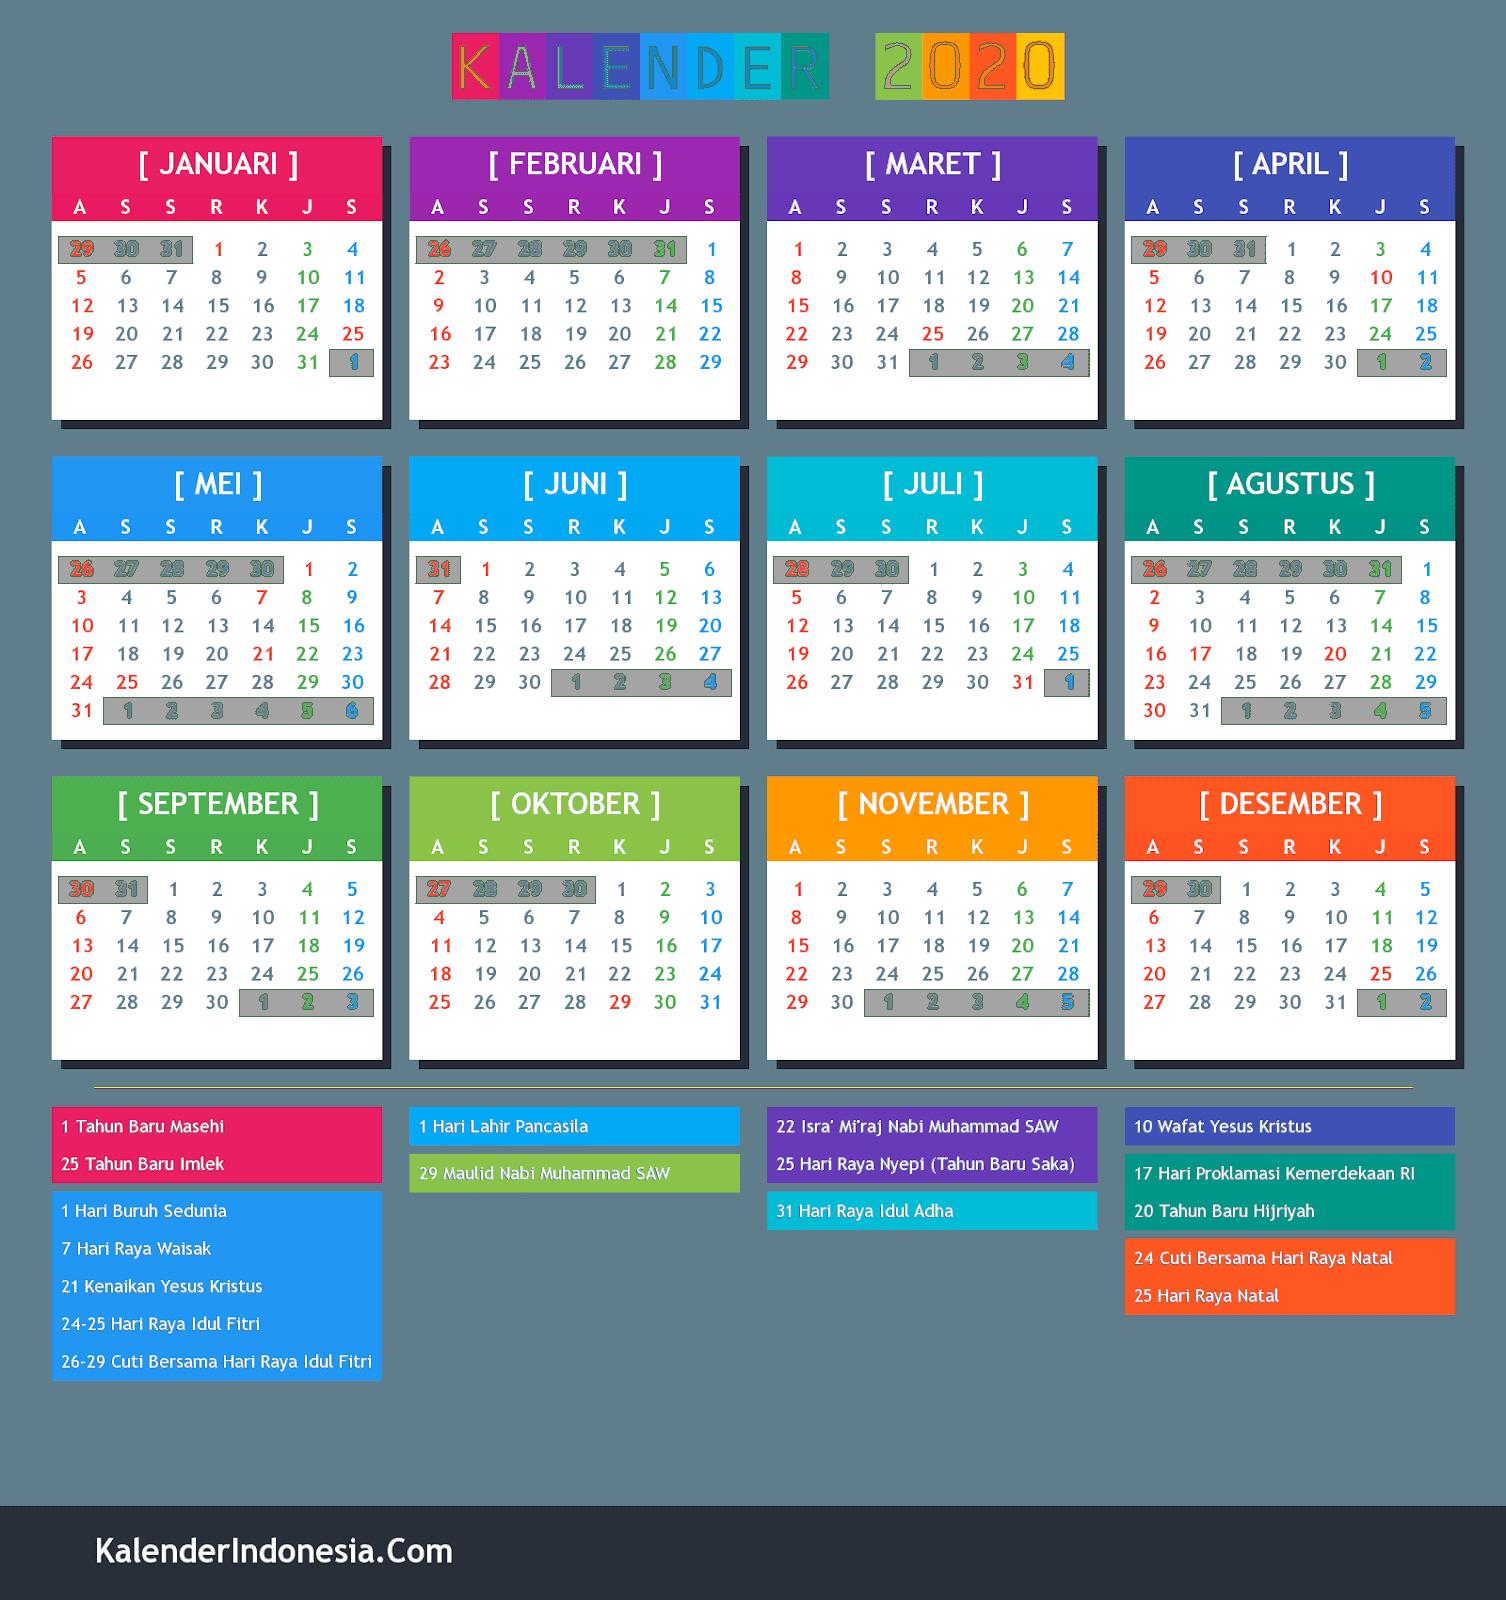 Kalender Indonesia Tahun 2020 Kalender Indonesia